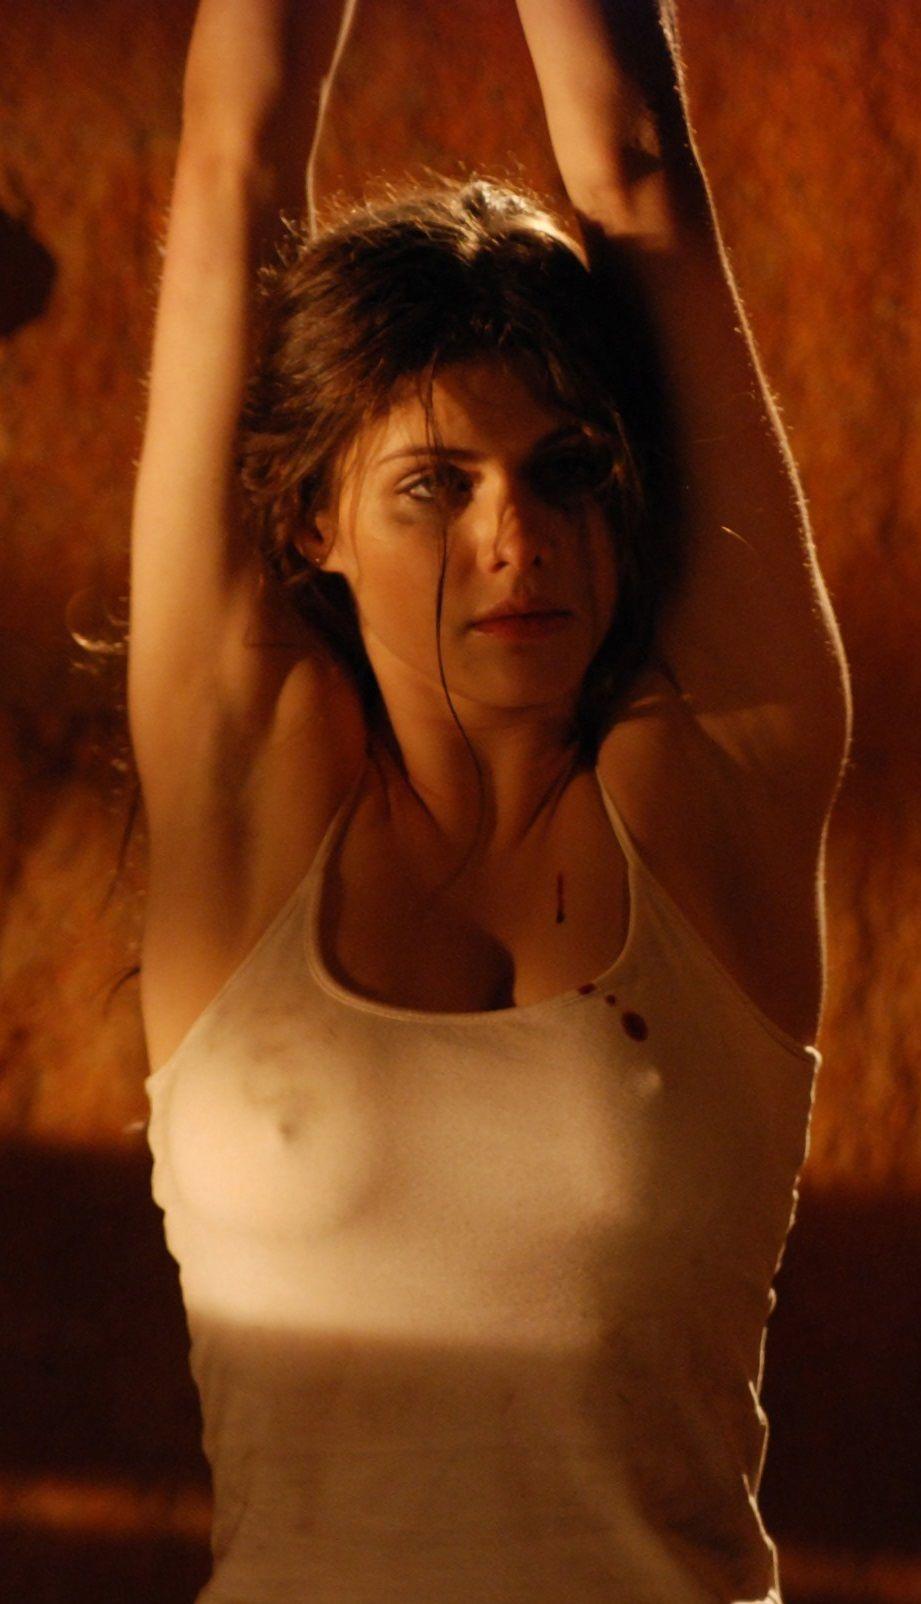 True detective topless scene